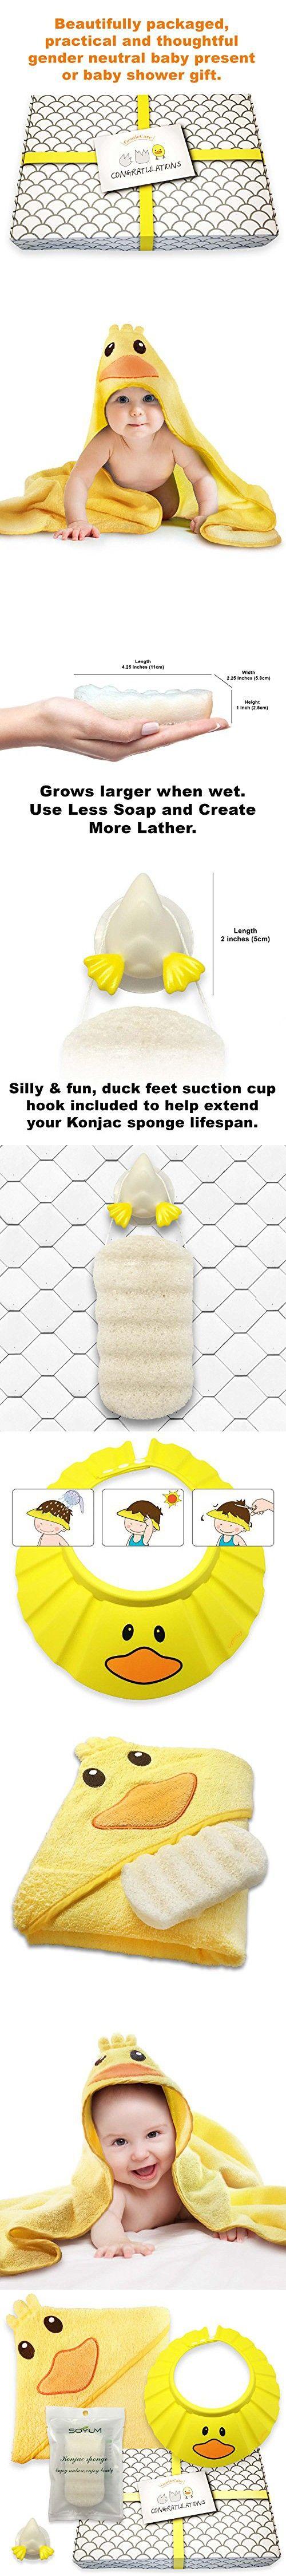 Gentle Care - Baby Shower Bath Gift Set - Soft 100% Cotton Hooded Bath Towel + Natural, Hypo-allergenic Konjac Sponge + Adjustable Foam Shampoo Cap + Beautifully Packaged